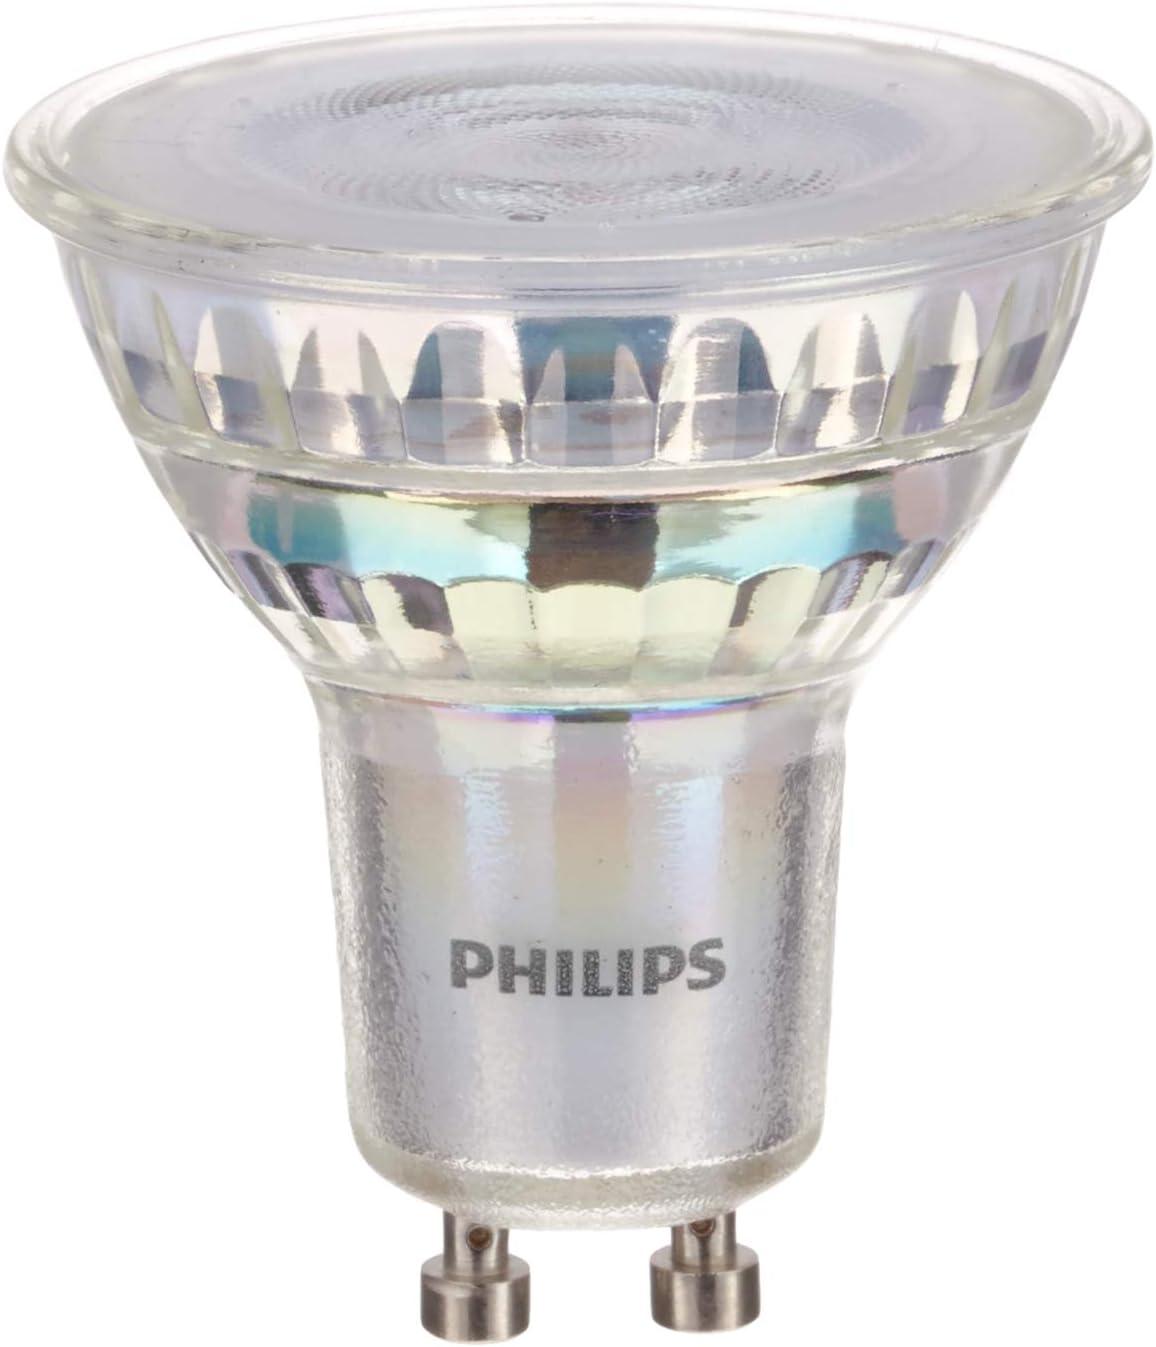 Philips - LED Gu10, 3.8 W Equivalente a 50 W, 345 Lumen, Regulable, Blanco Cálido, Pack de 6 Bombillas